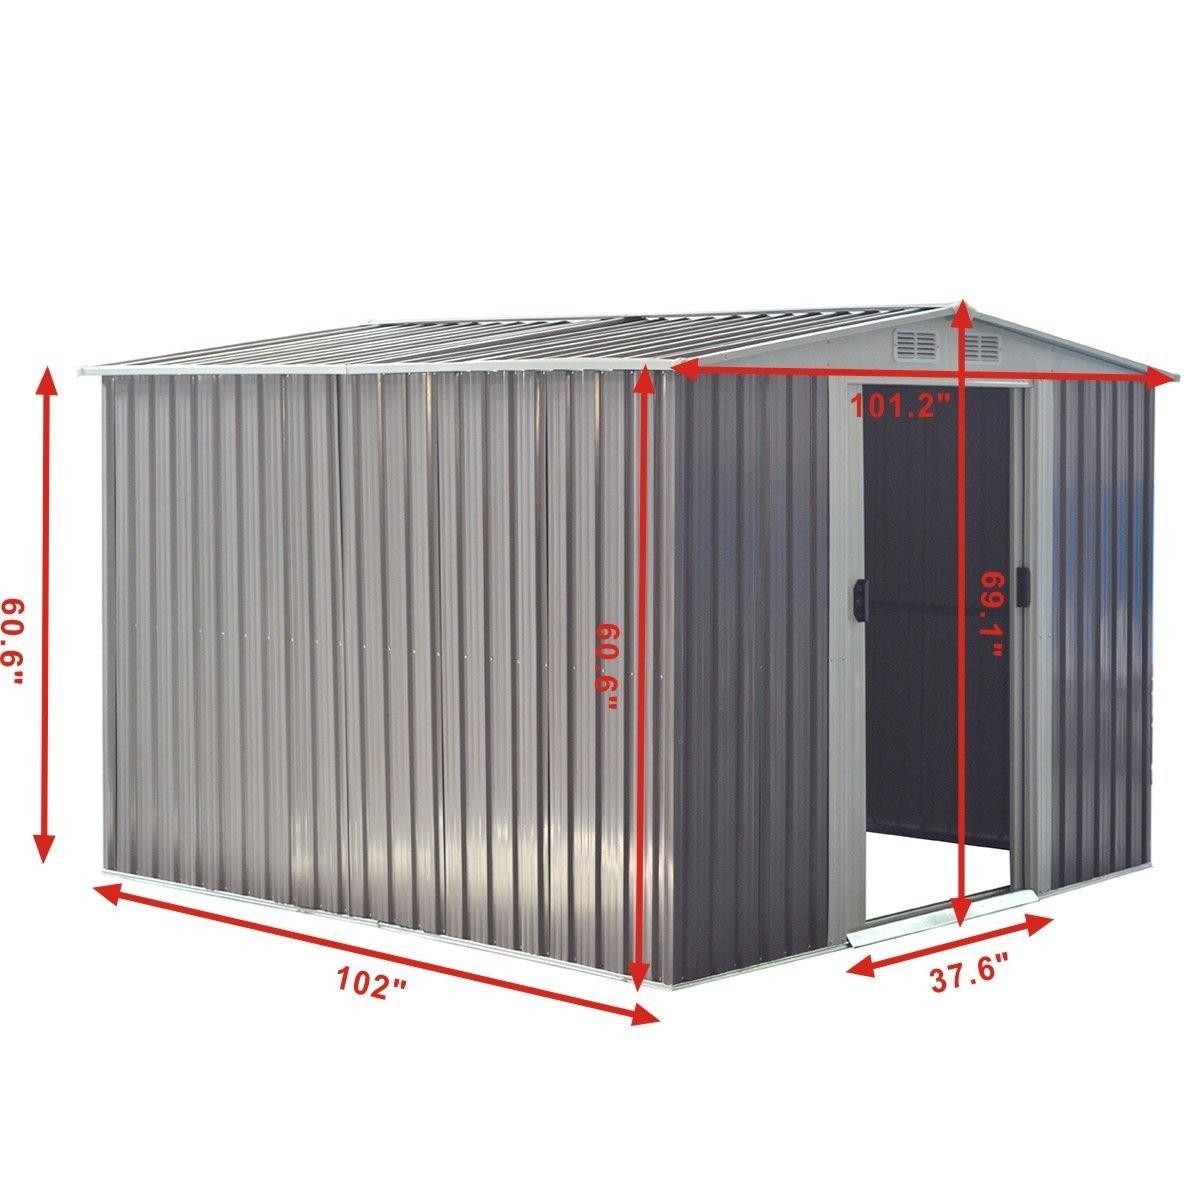 Amazon.com: Cobertizo de acero galvanizado Goplus para ...